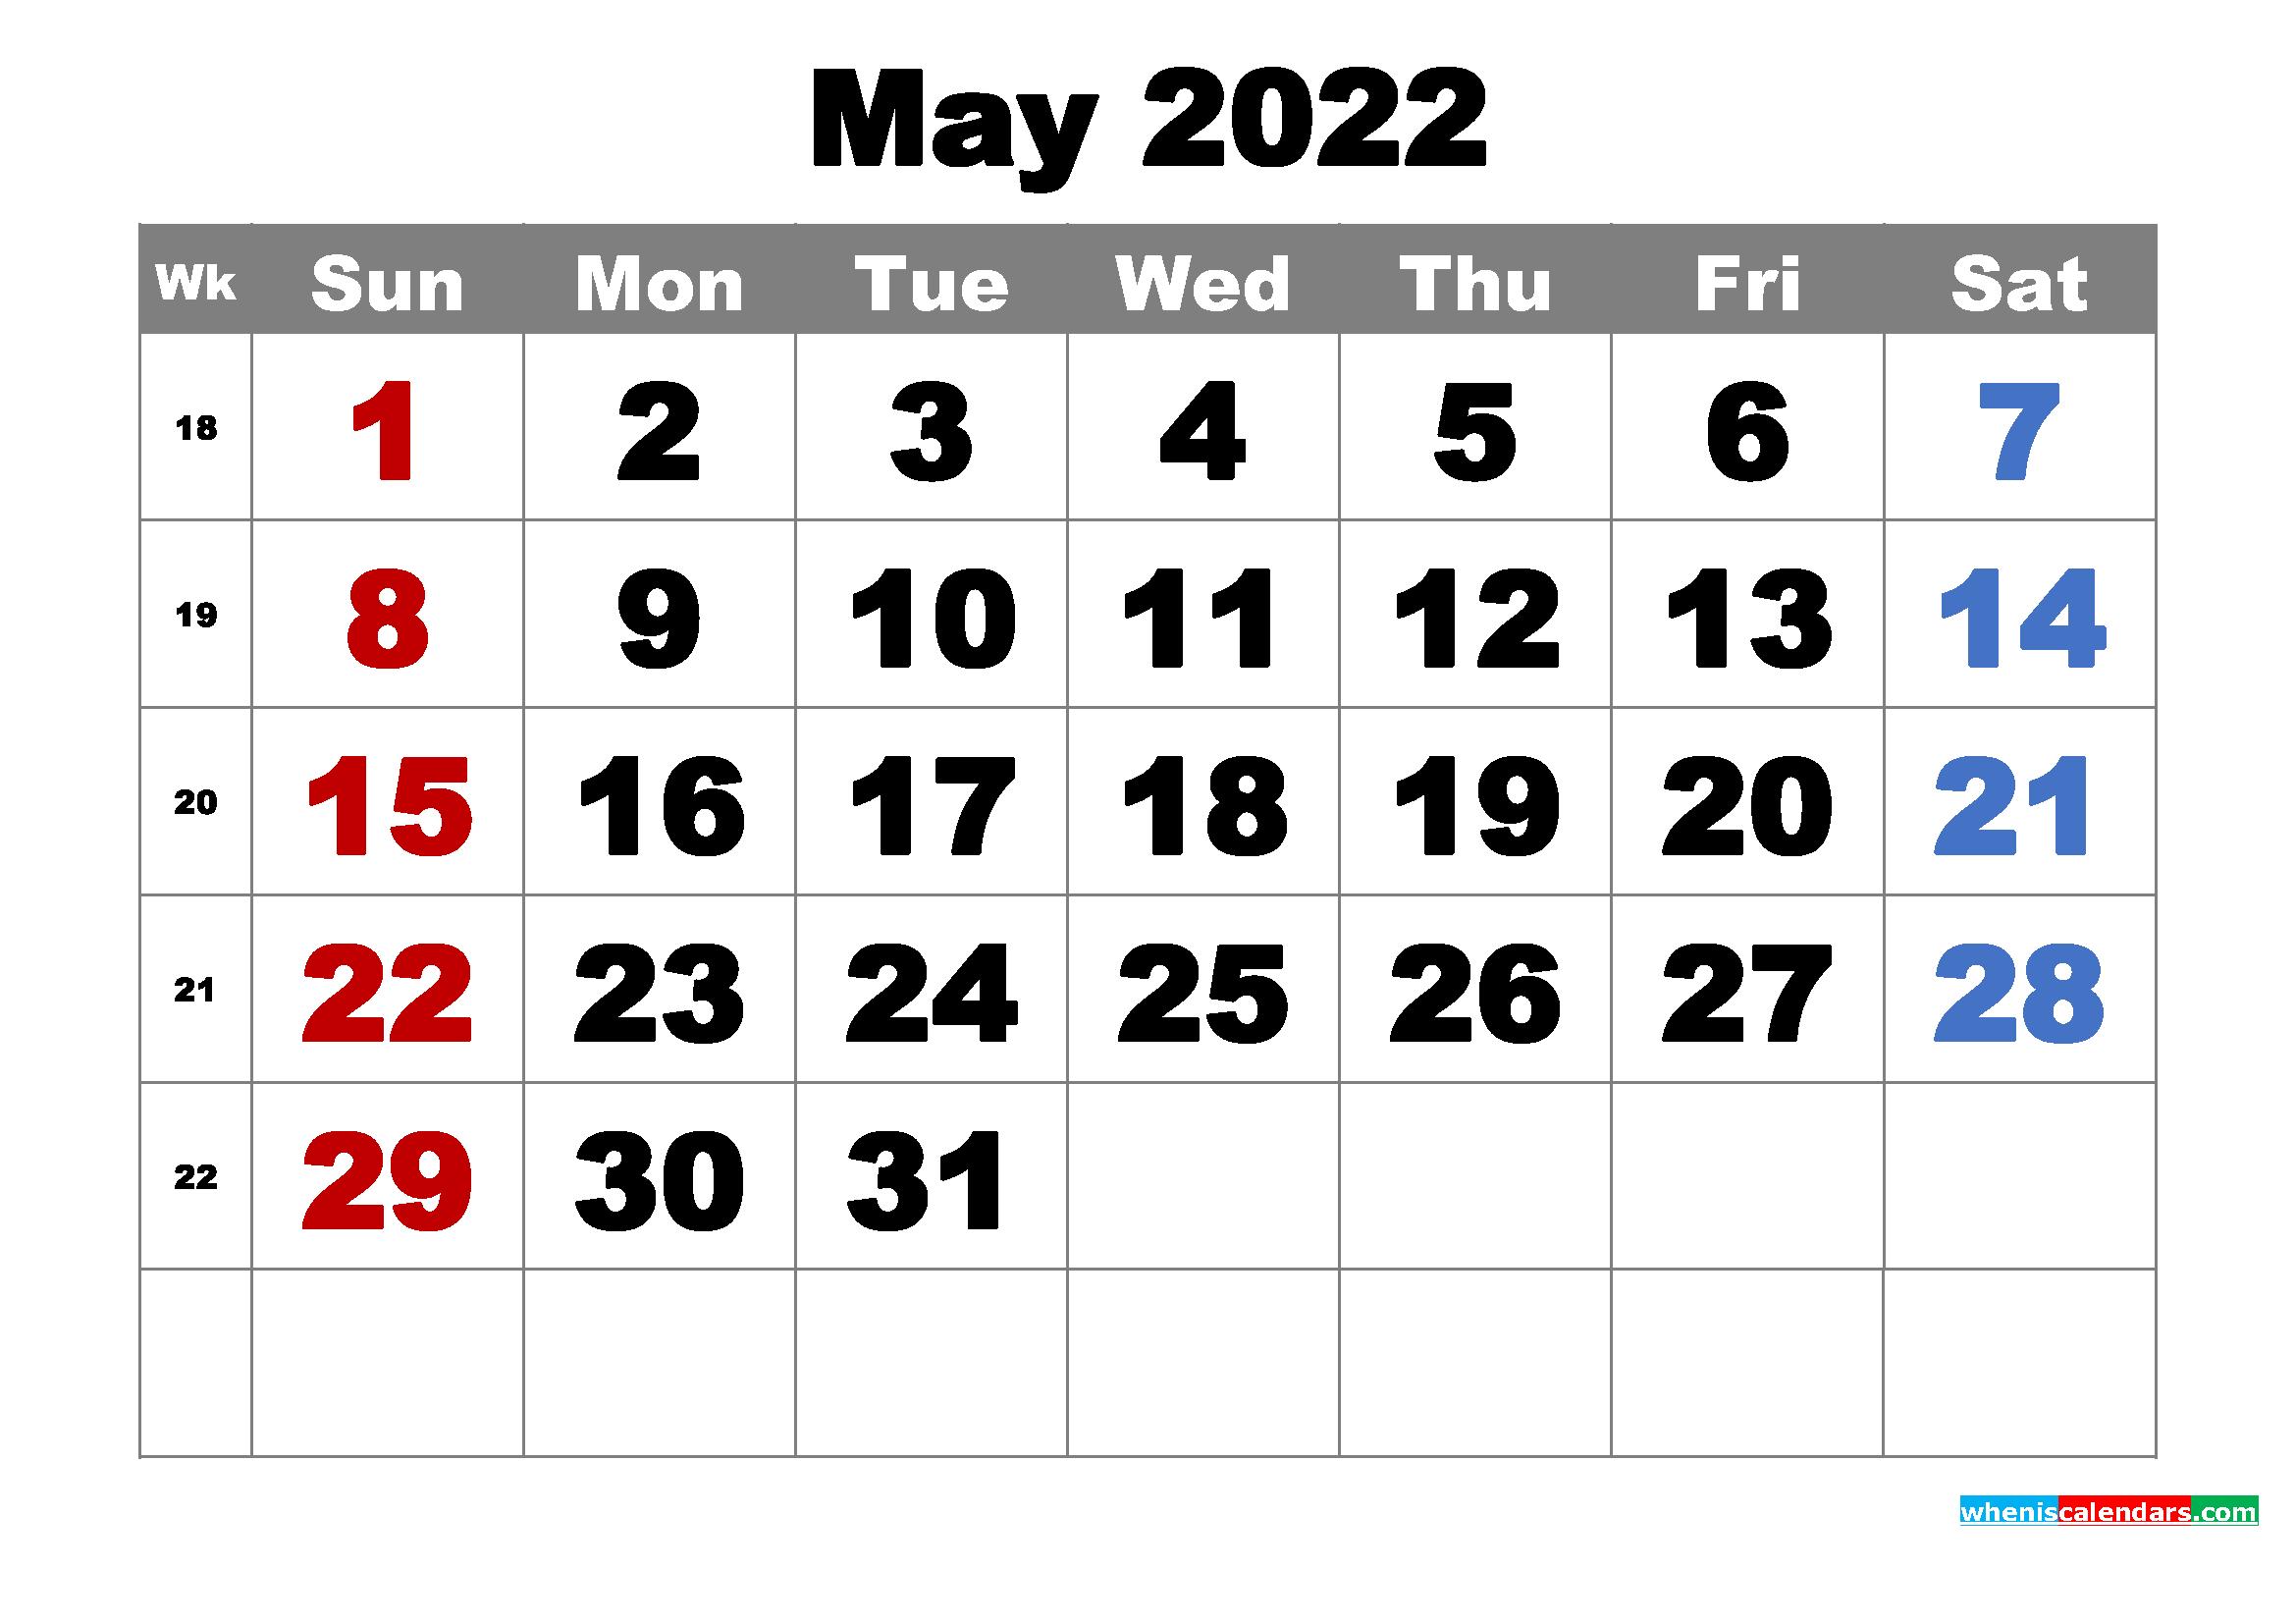 Free Printable May 2022 Calendar Word, PDF, Image